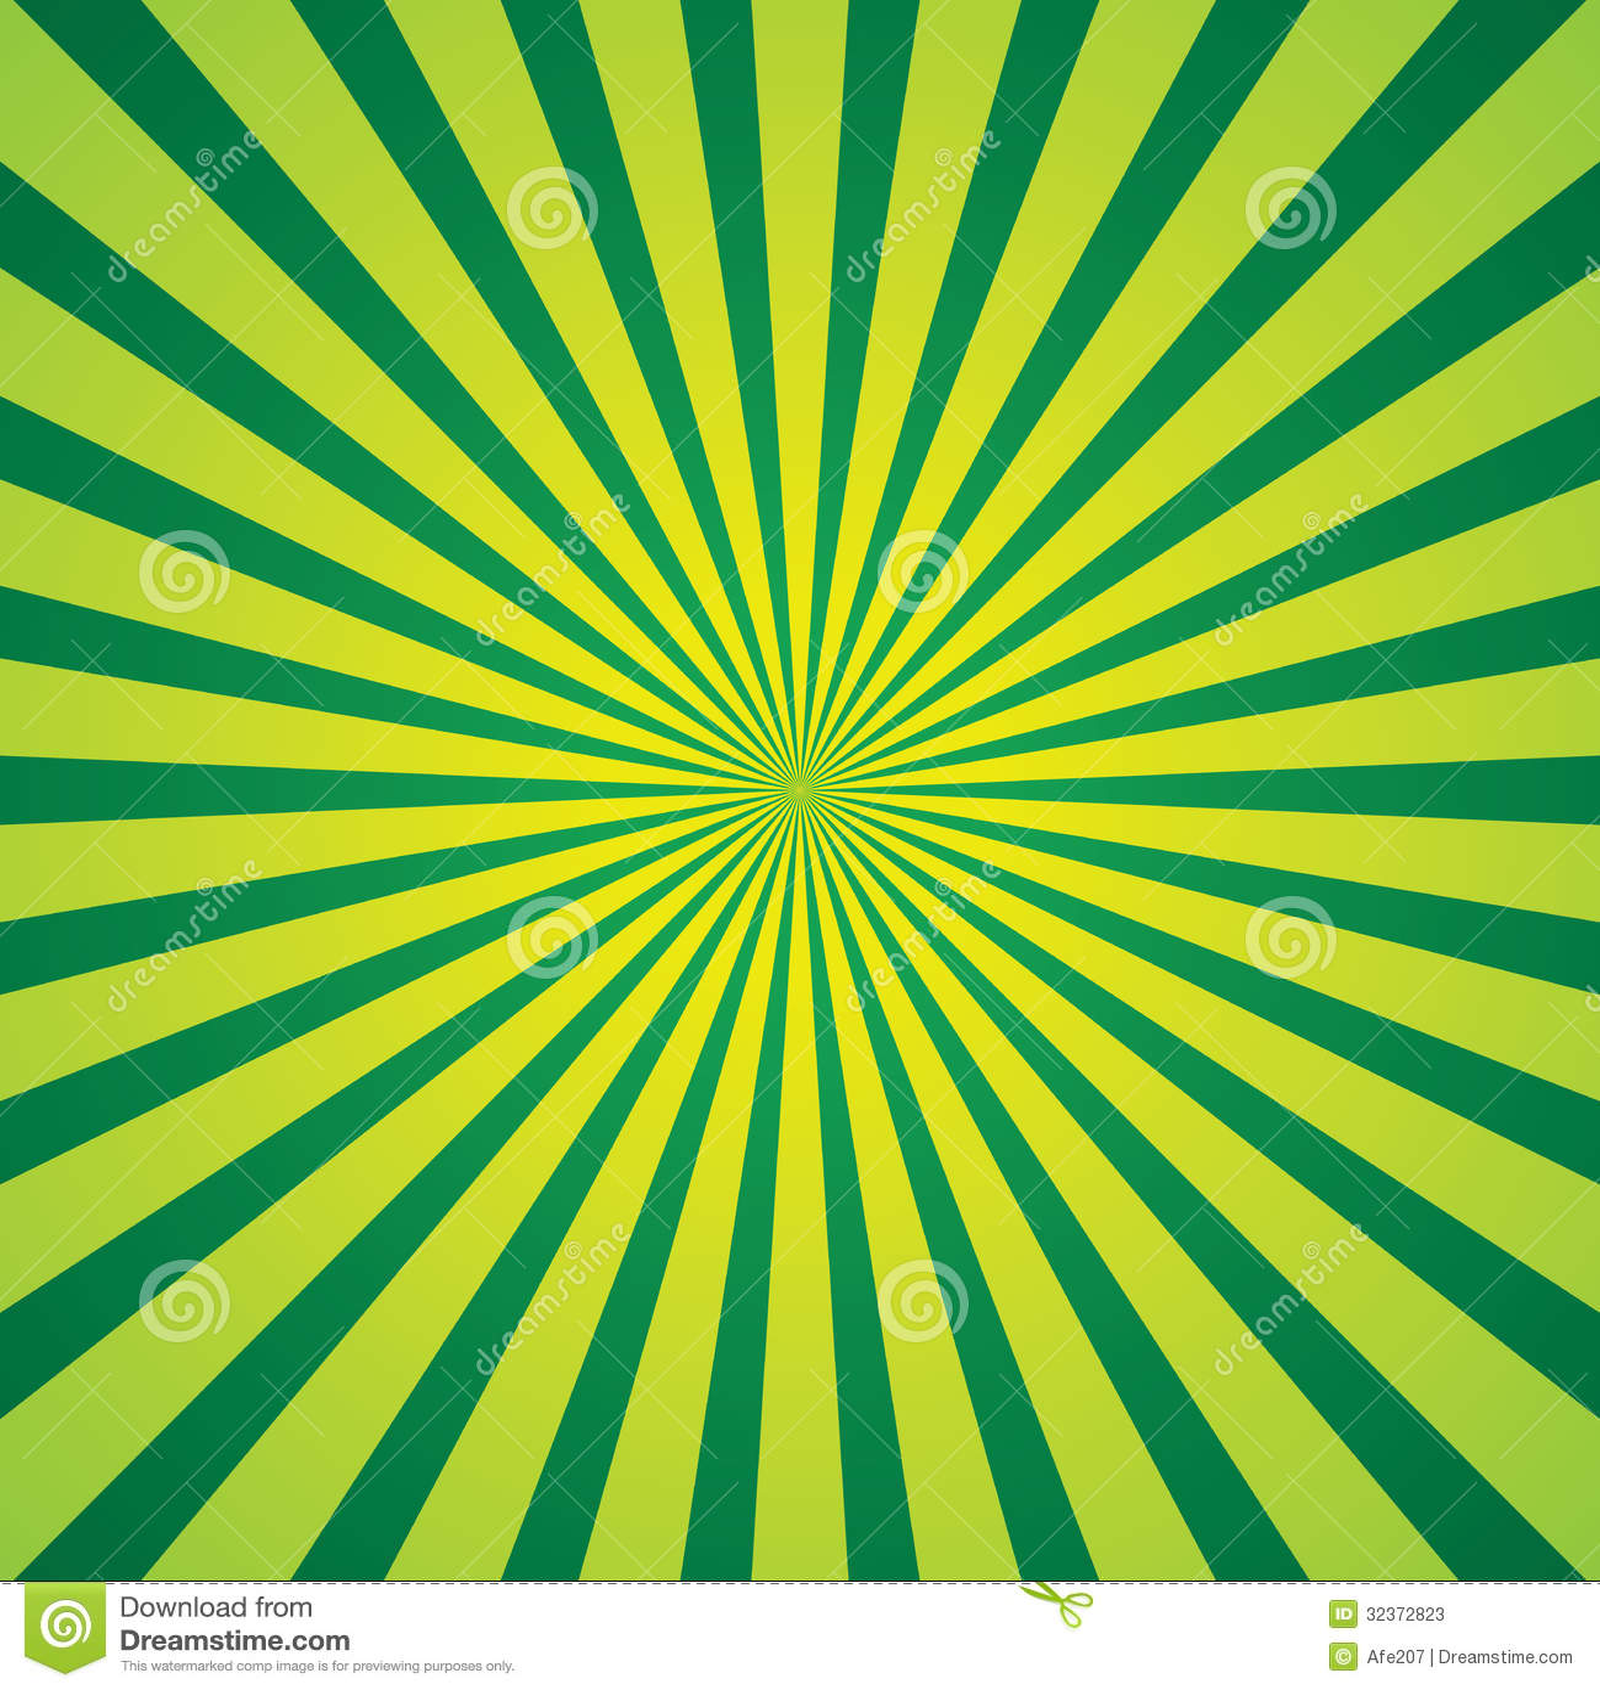 green rays background - photo #2